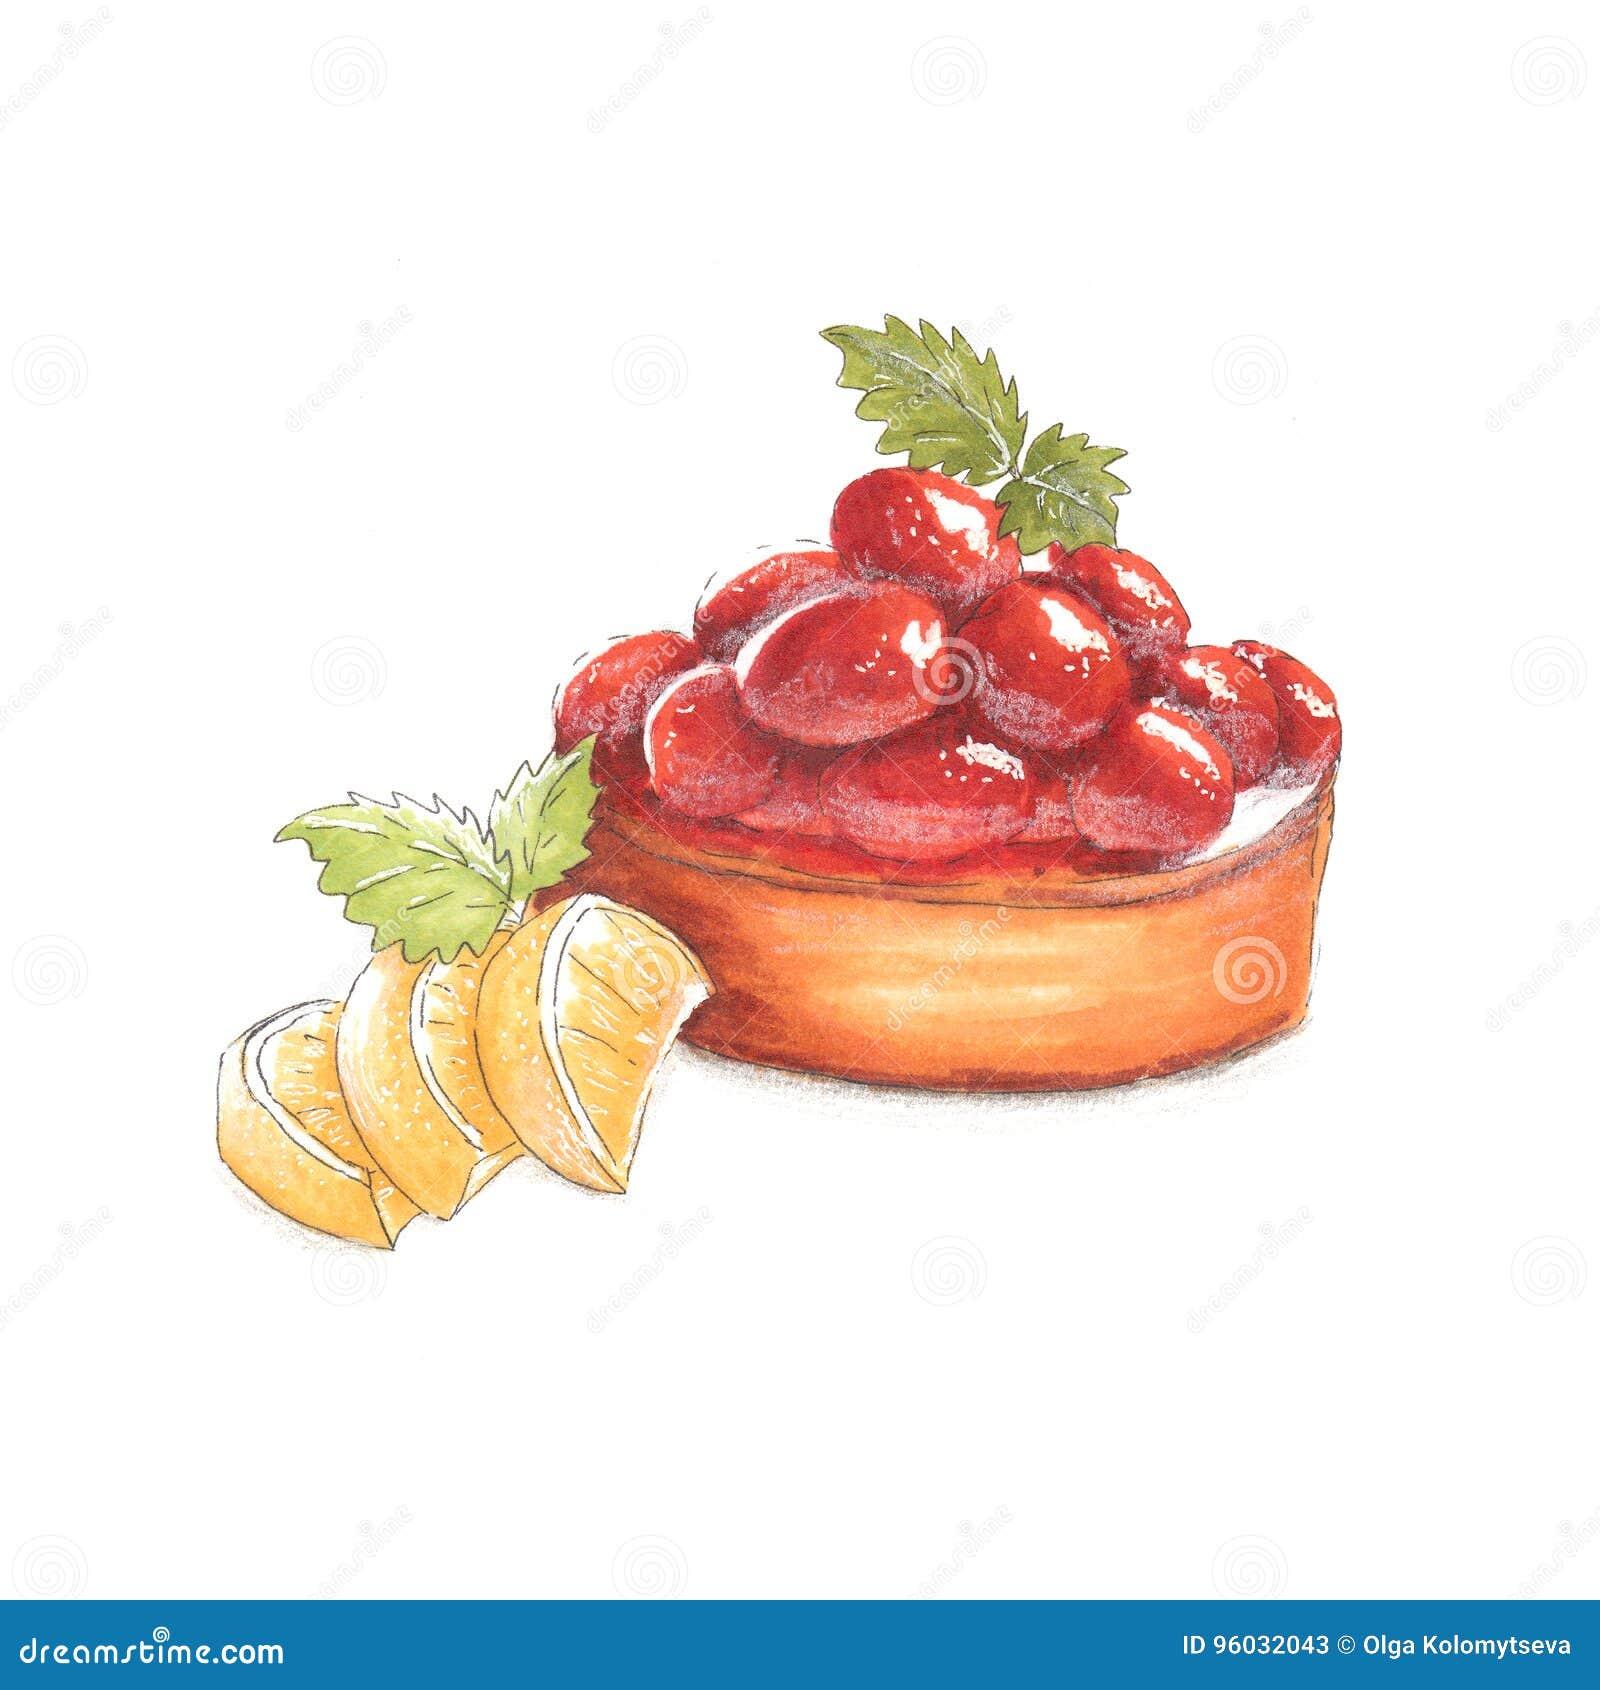 Handmade markier rysująca ilustracja deser z jagodami i cytryna plasterkami